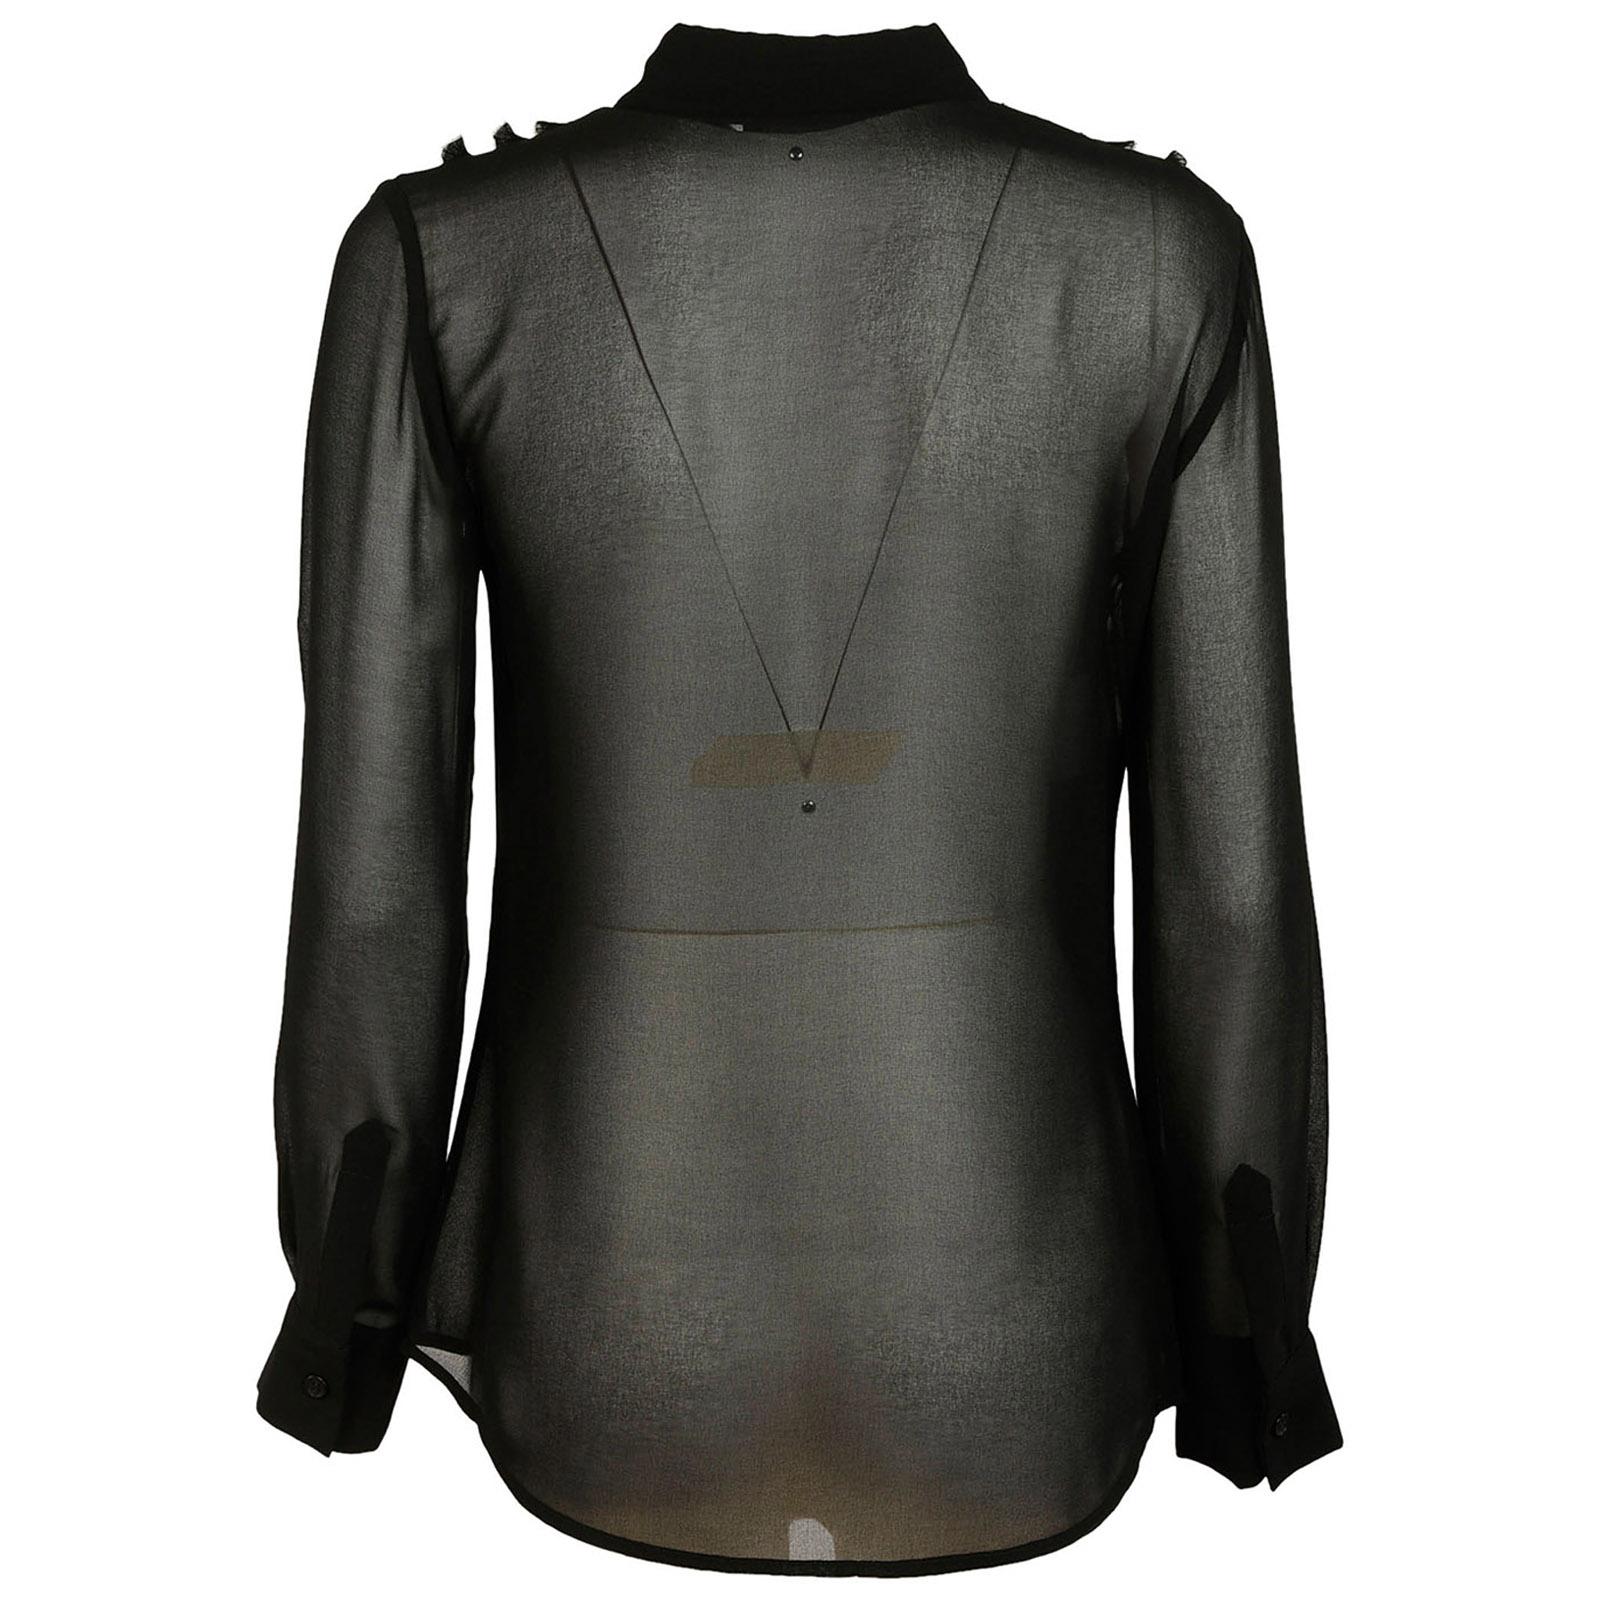 Women's shirt long sleeve